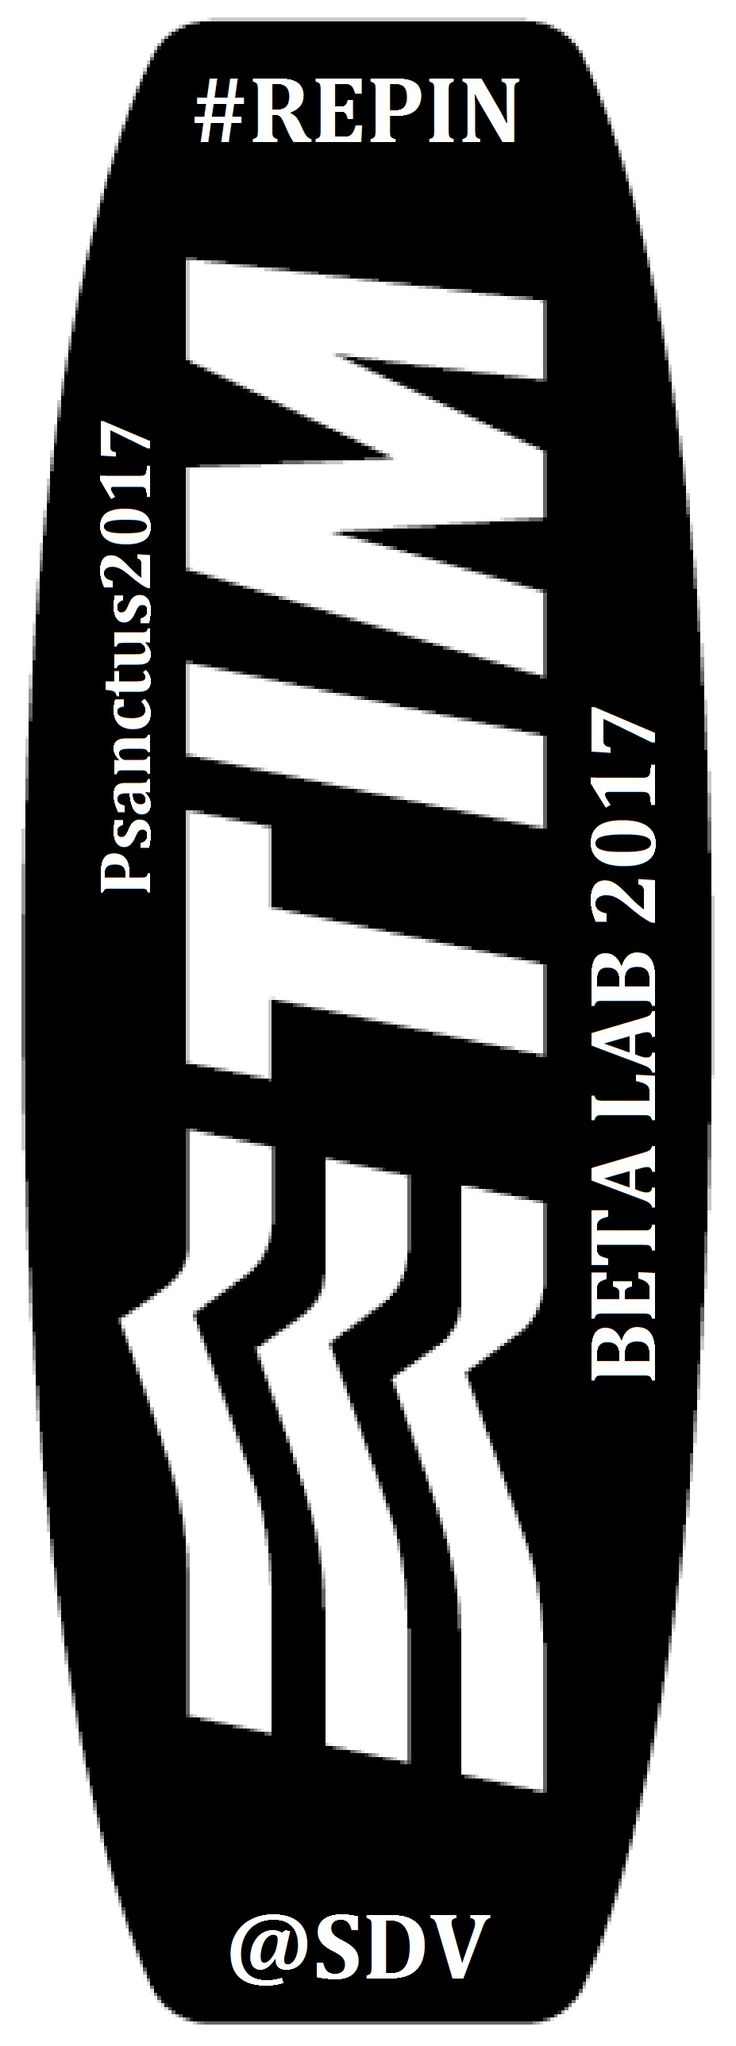 TIM BETA LAB 2017